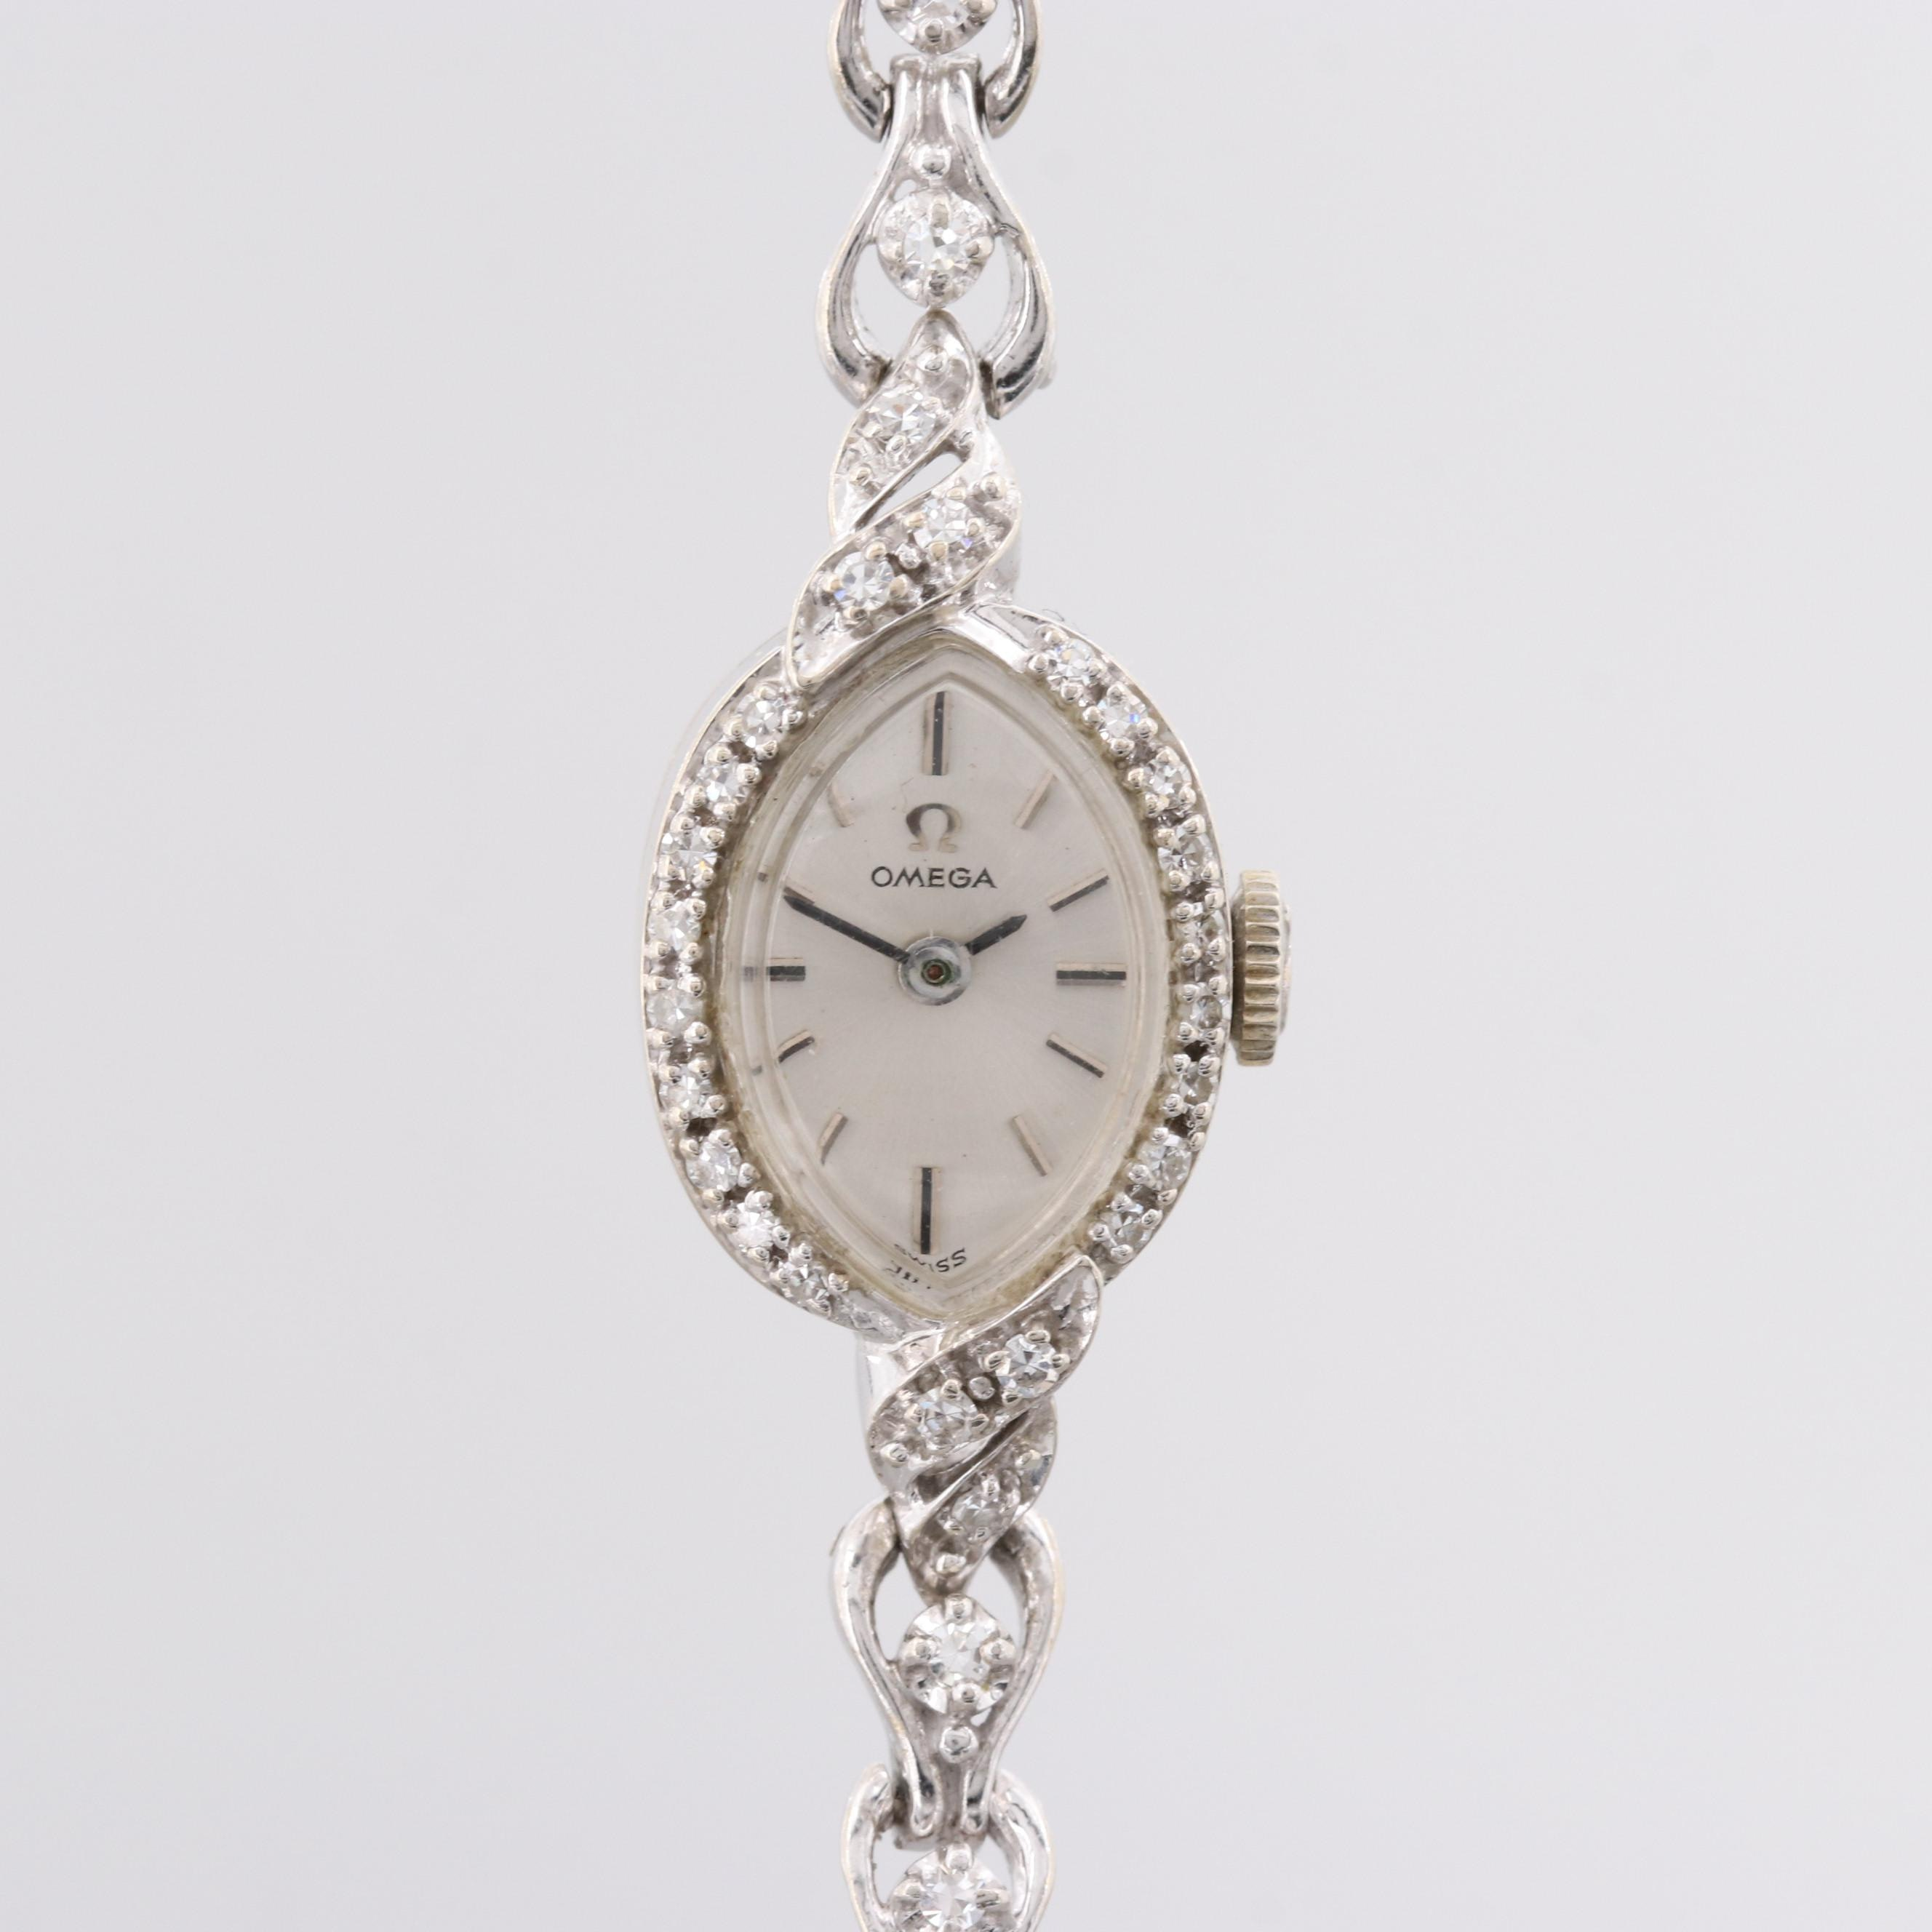 Omega 14K White Gold Diamond Wristwatch